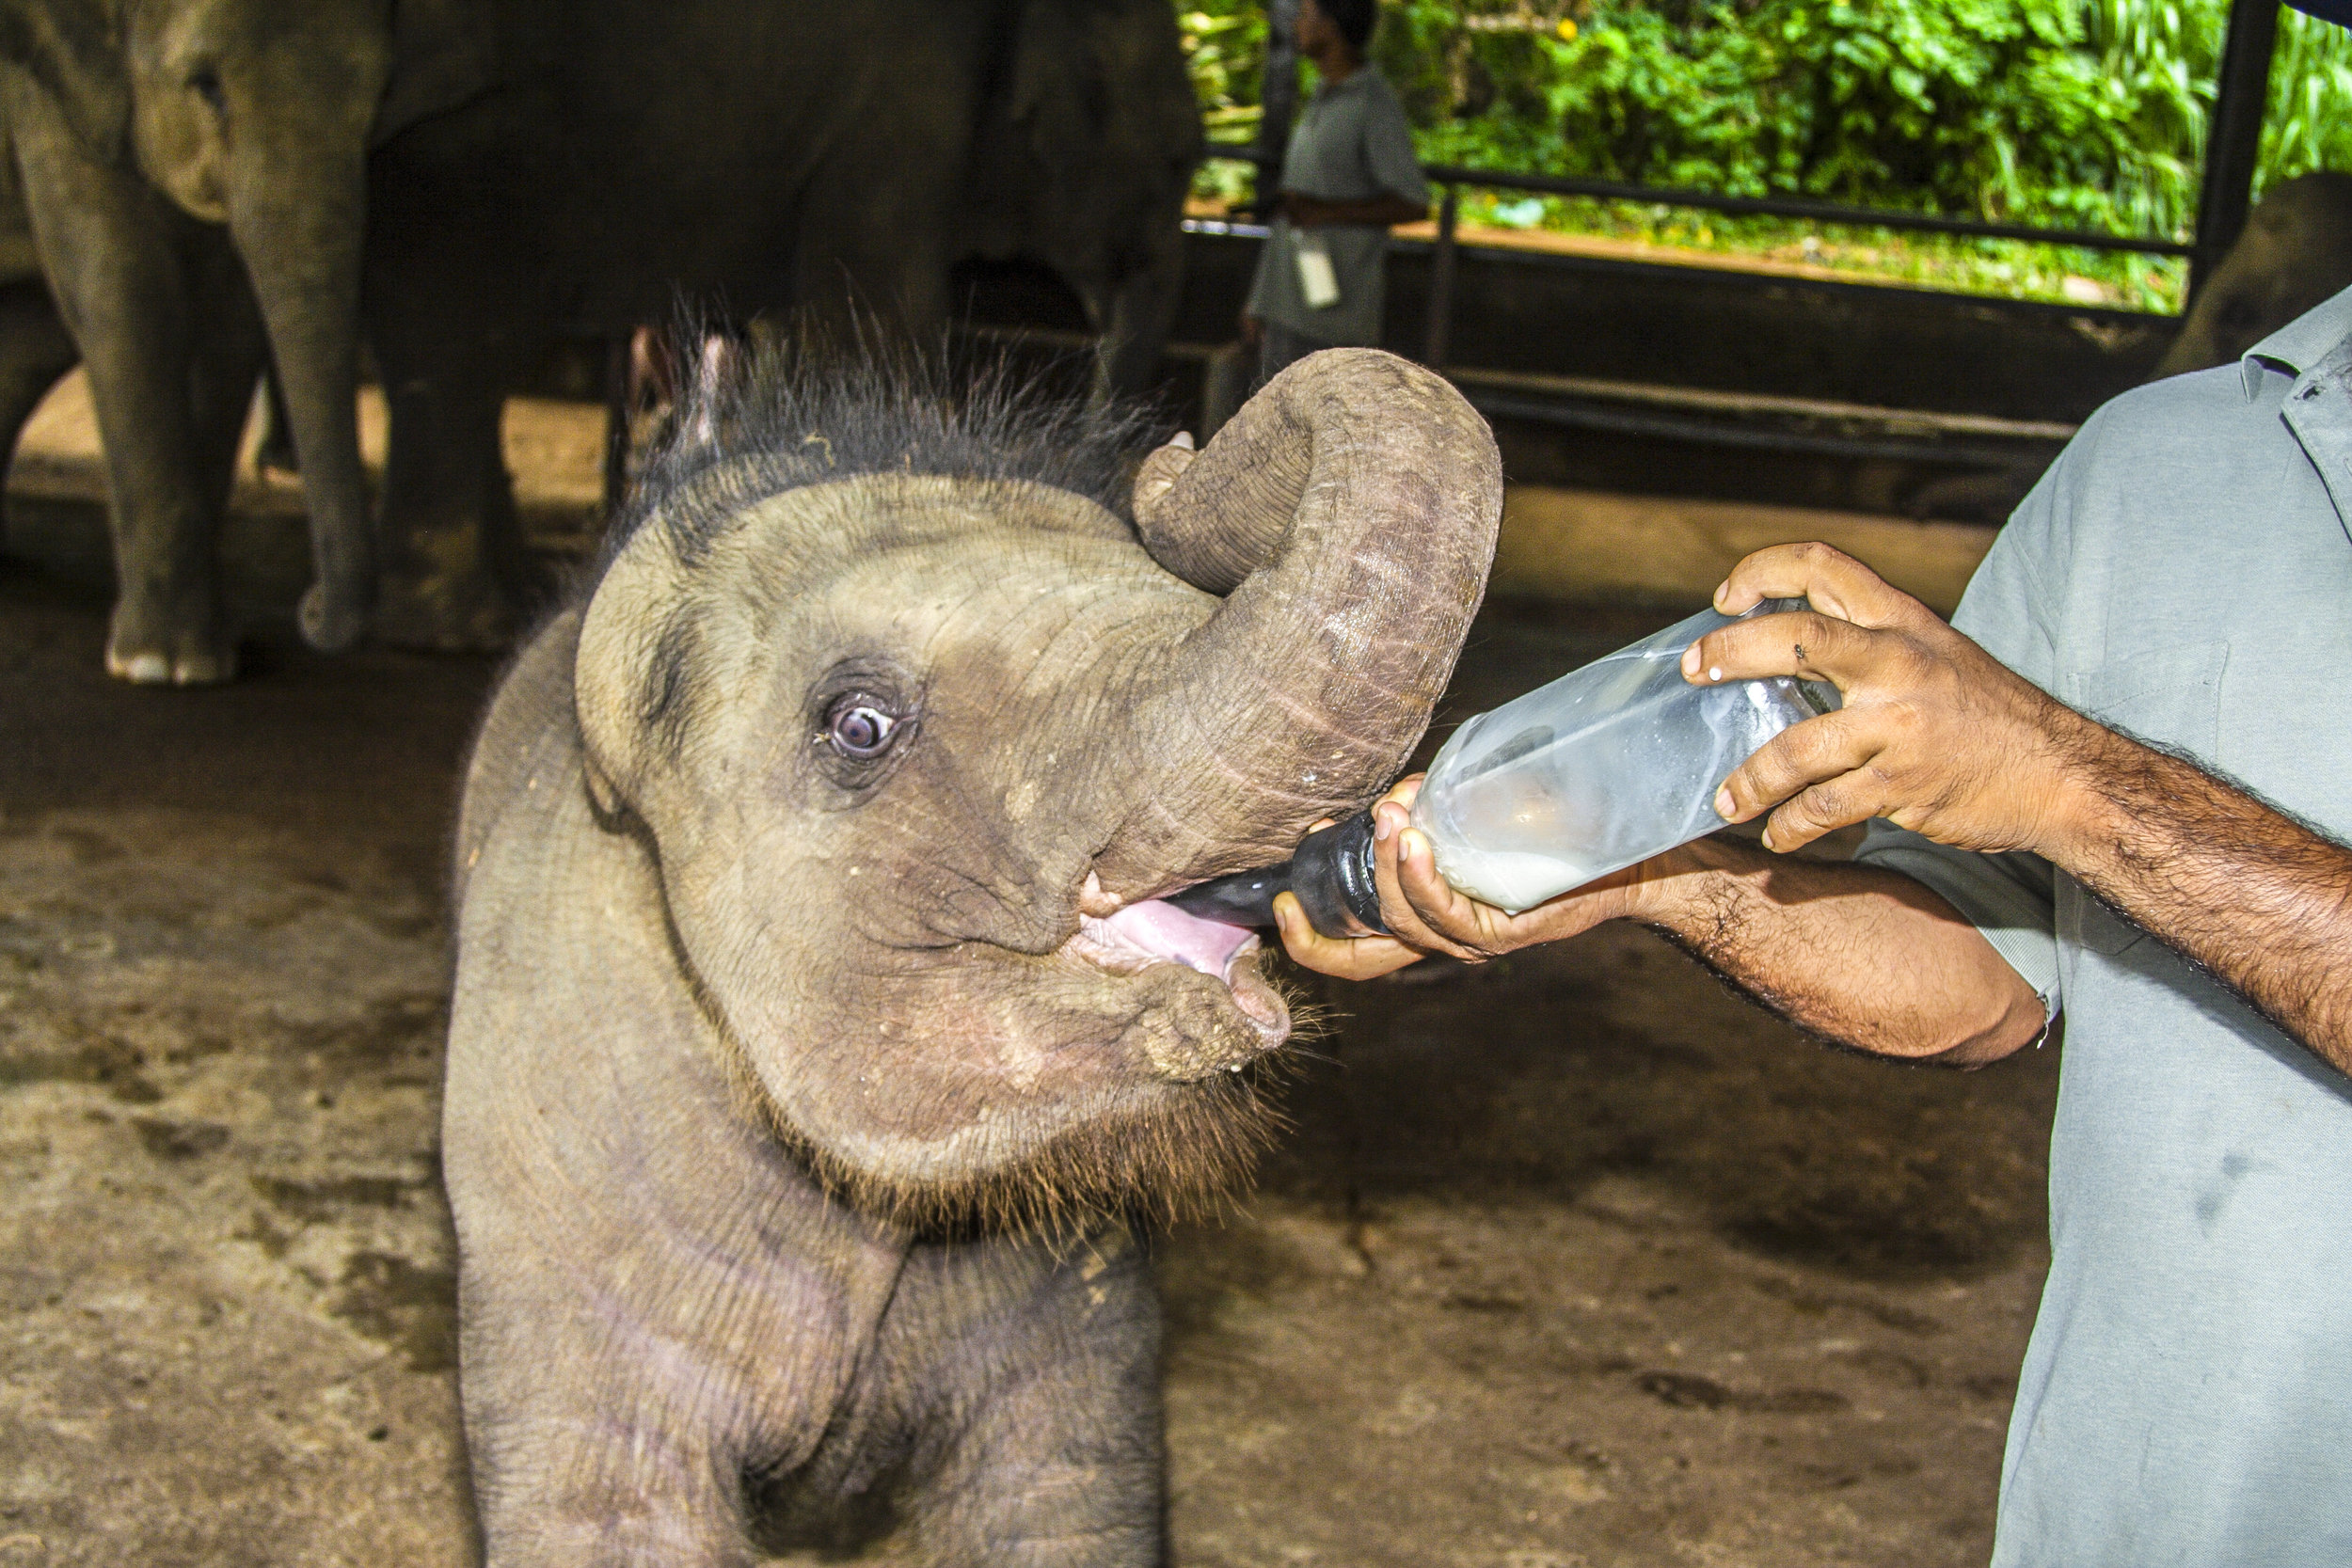 srilanka_bigstock-Elefant-Baby-Gets-Milk-To-Drin-90927356.jpg